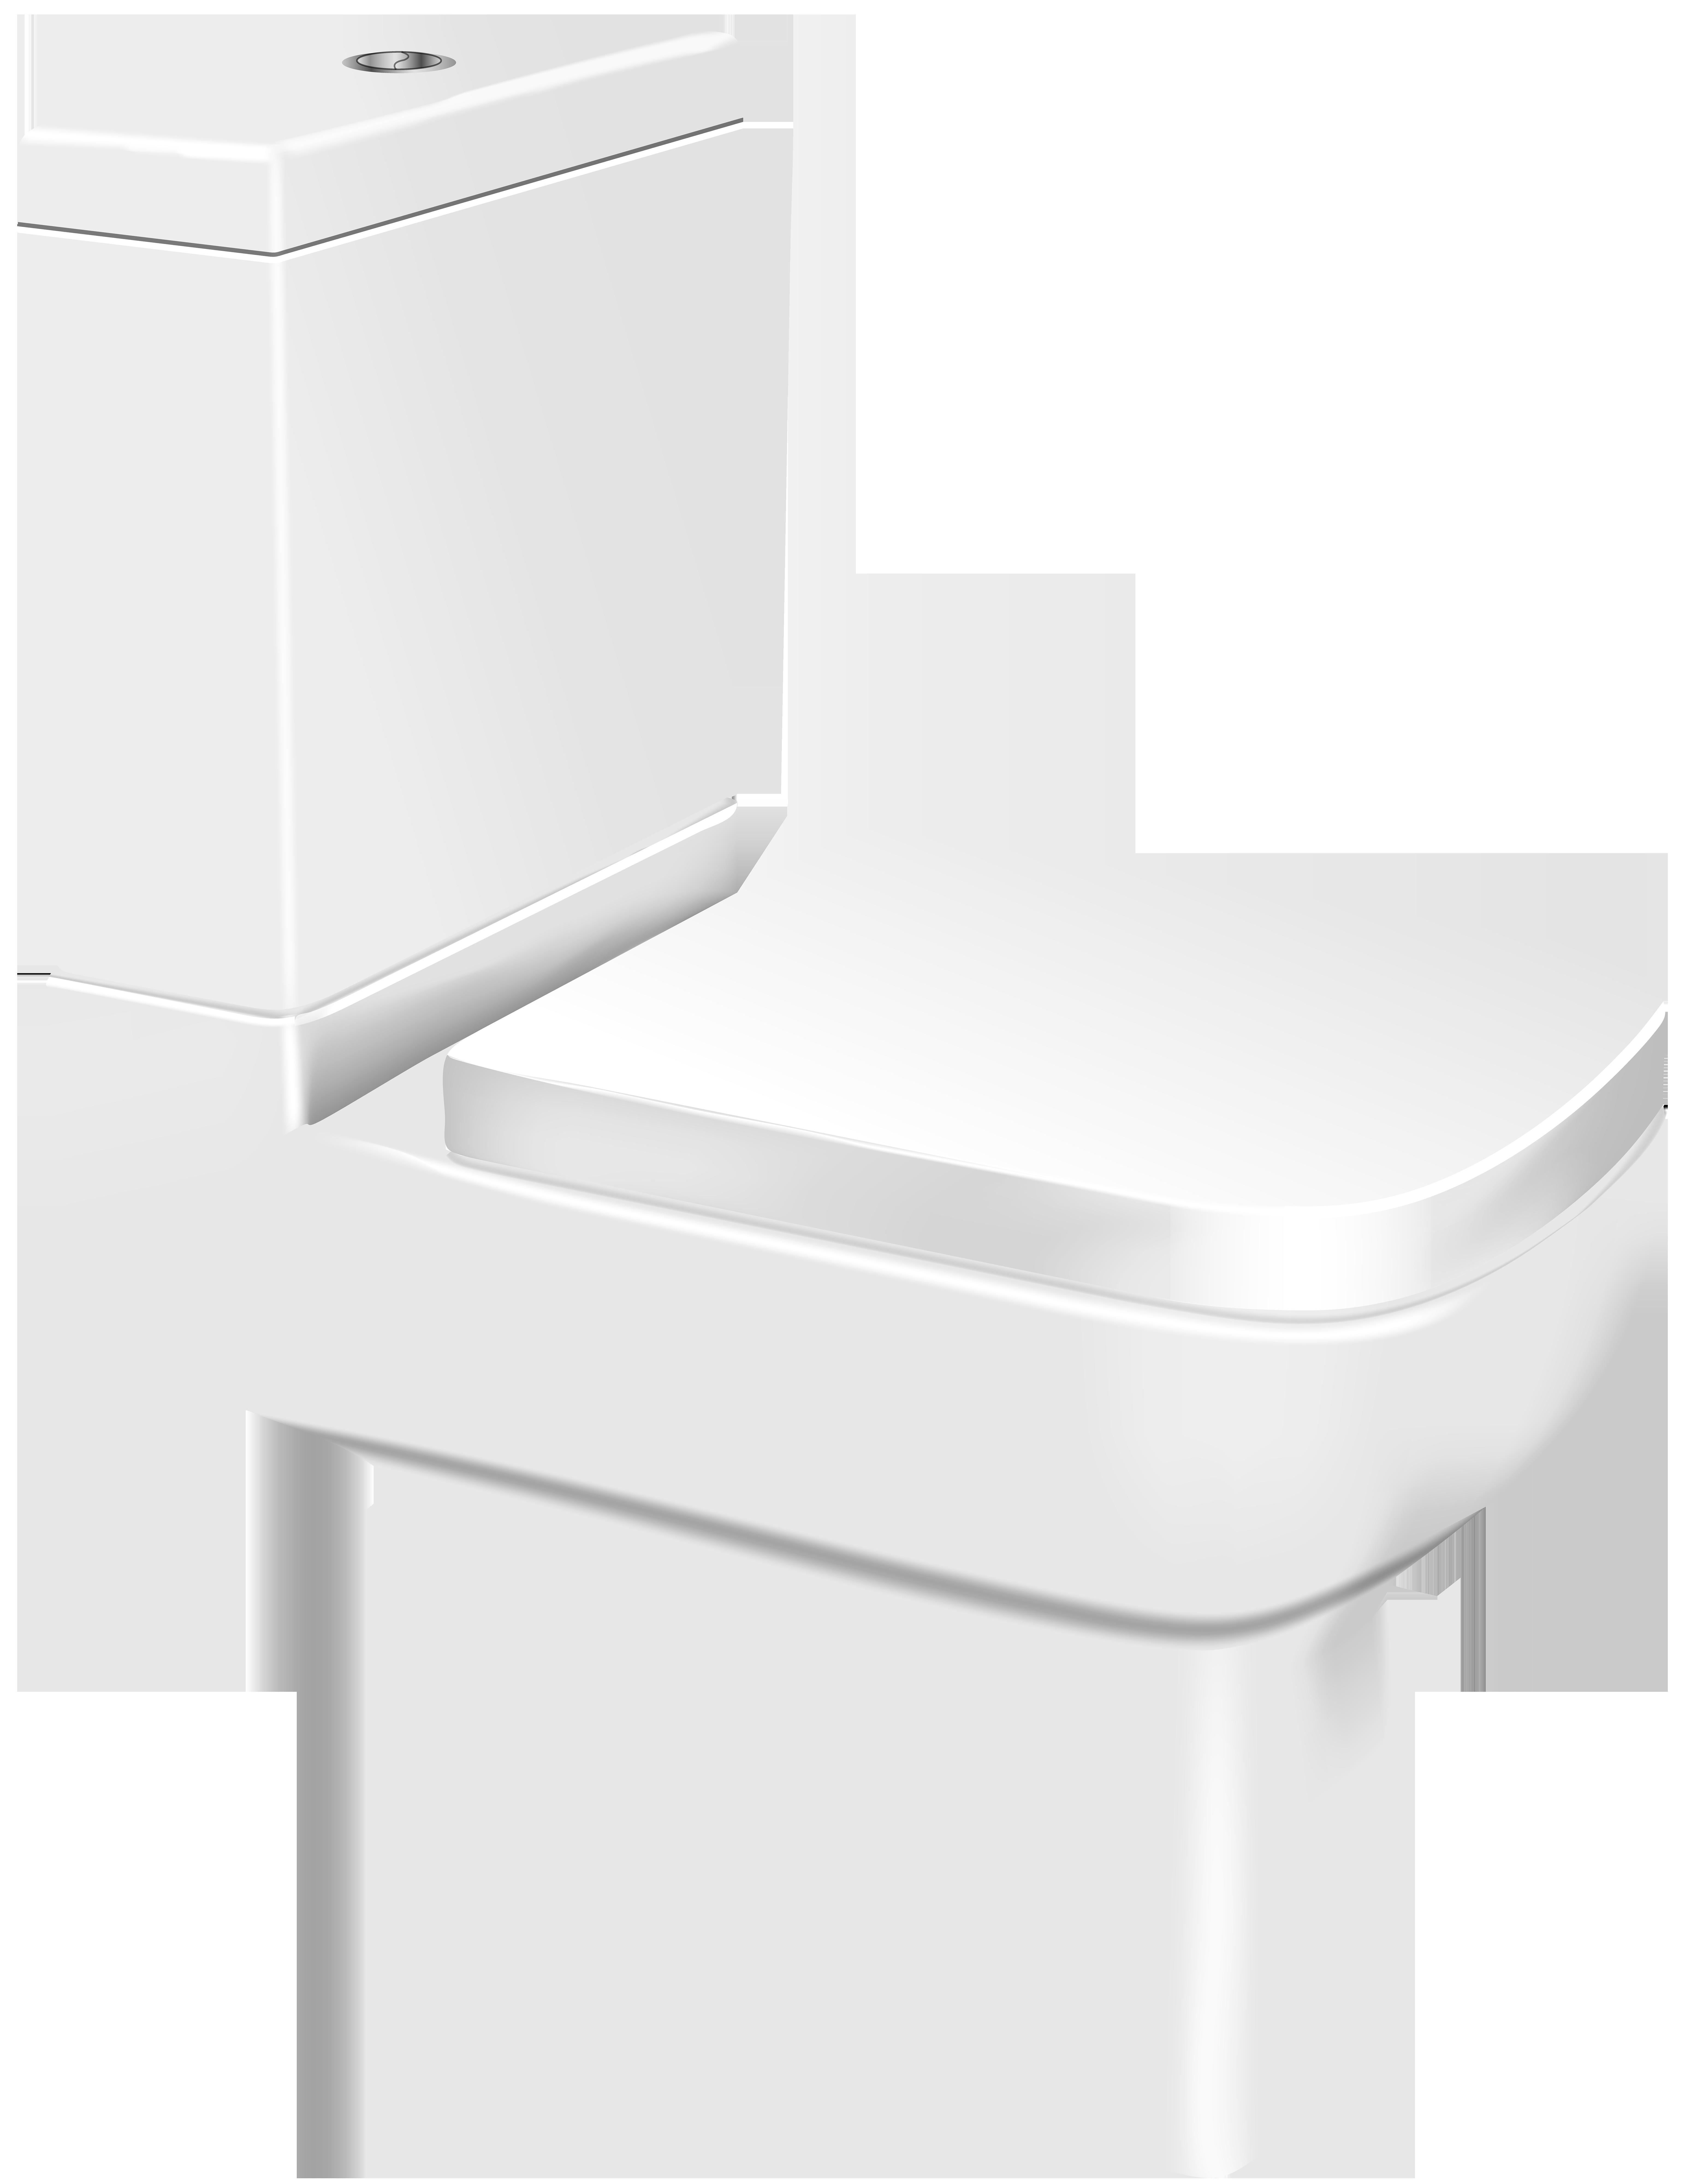 School bathroom clipart black and white graphic transparent White Toilet PNG Clip Art - Best WEB Clipart graphic transparent